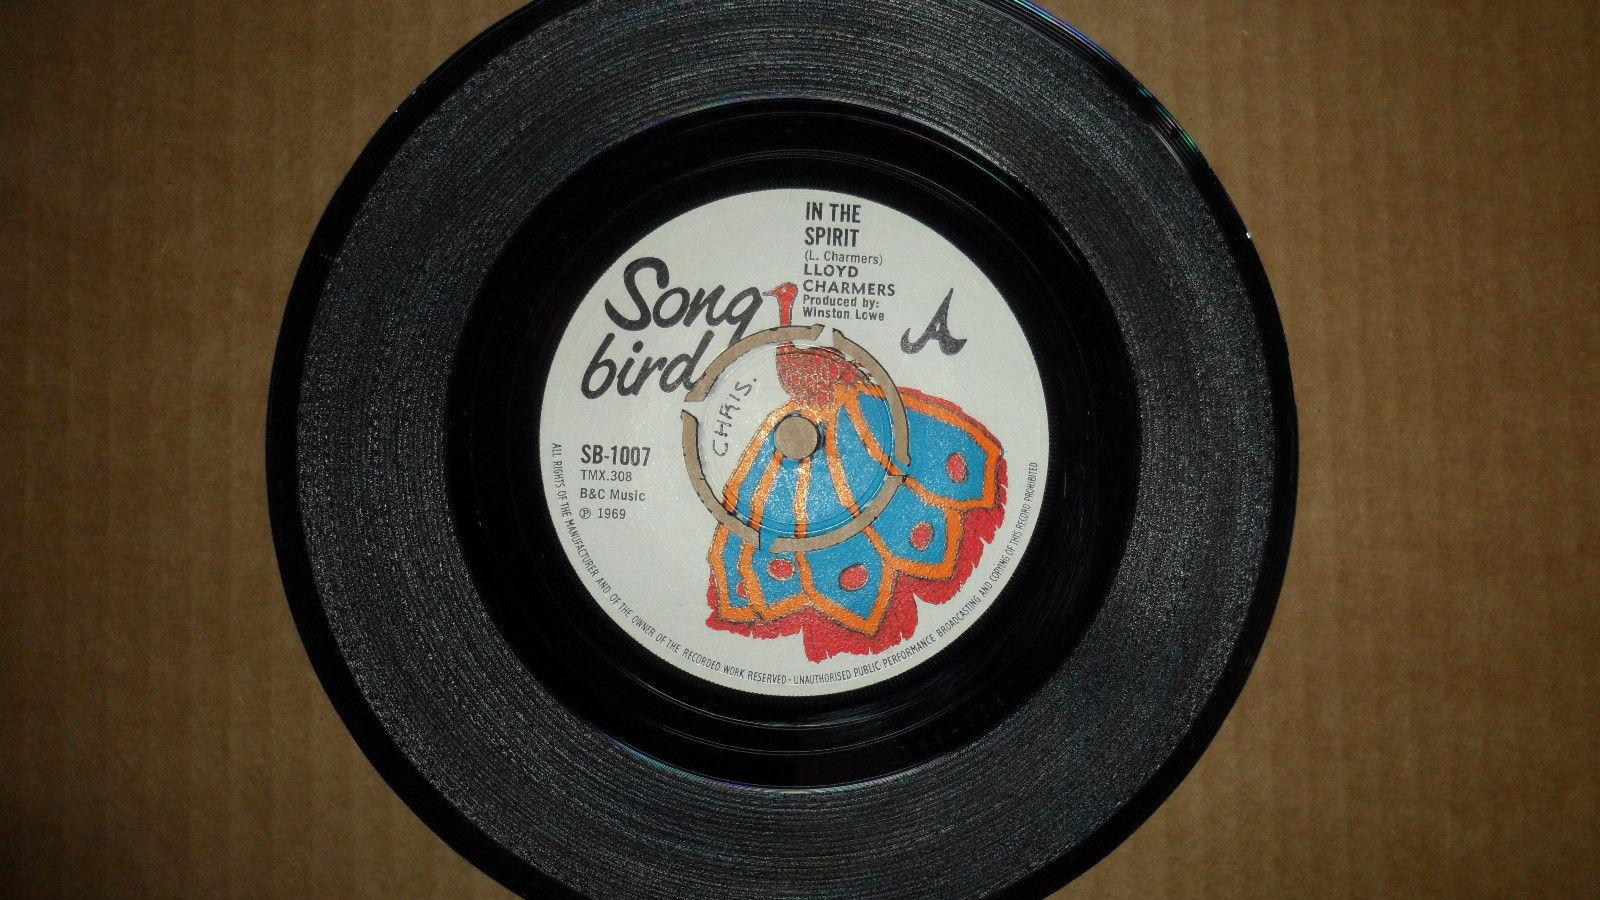 LLOYD CHARMERS 'IN THE SPIRIT / DUCKEY LUCKEY' SB 1007 SONG BIRD 1969 UK ISSUE